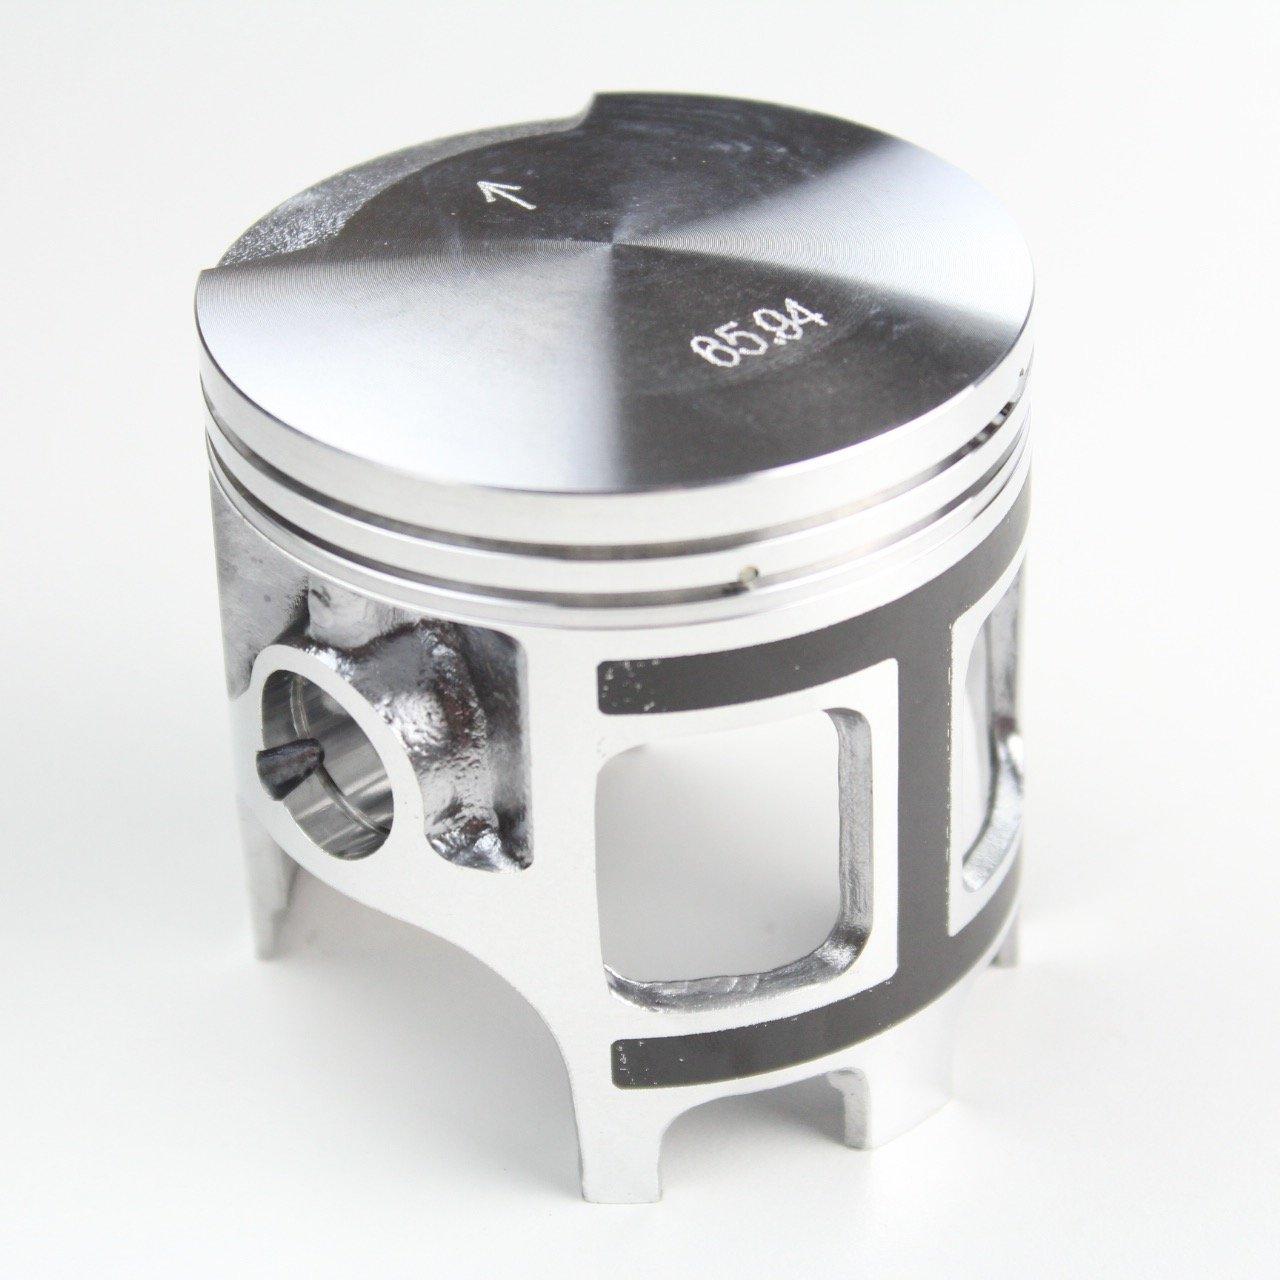 NICHE Cylinder Piston Gasket Top End Kit for Yamaha Blaster 200 YFS200 1988-2006